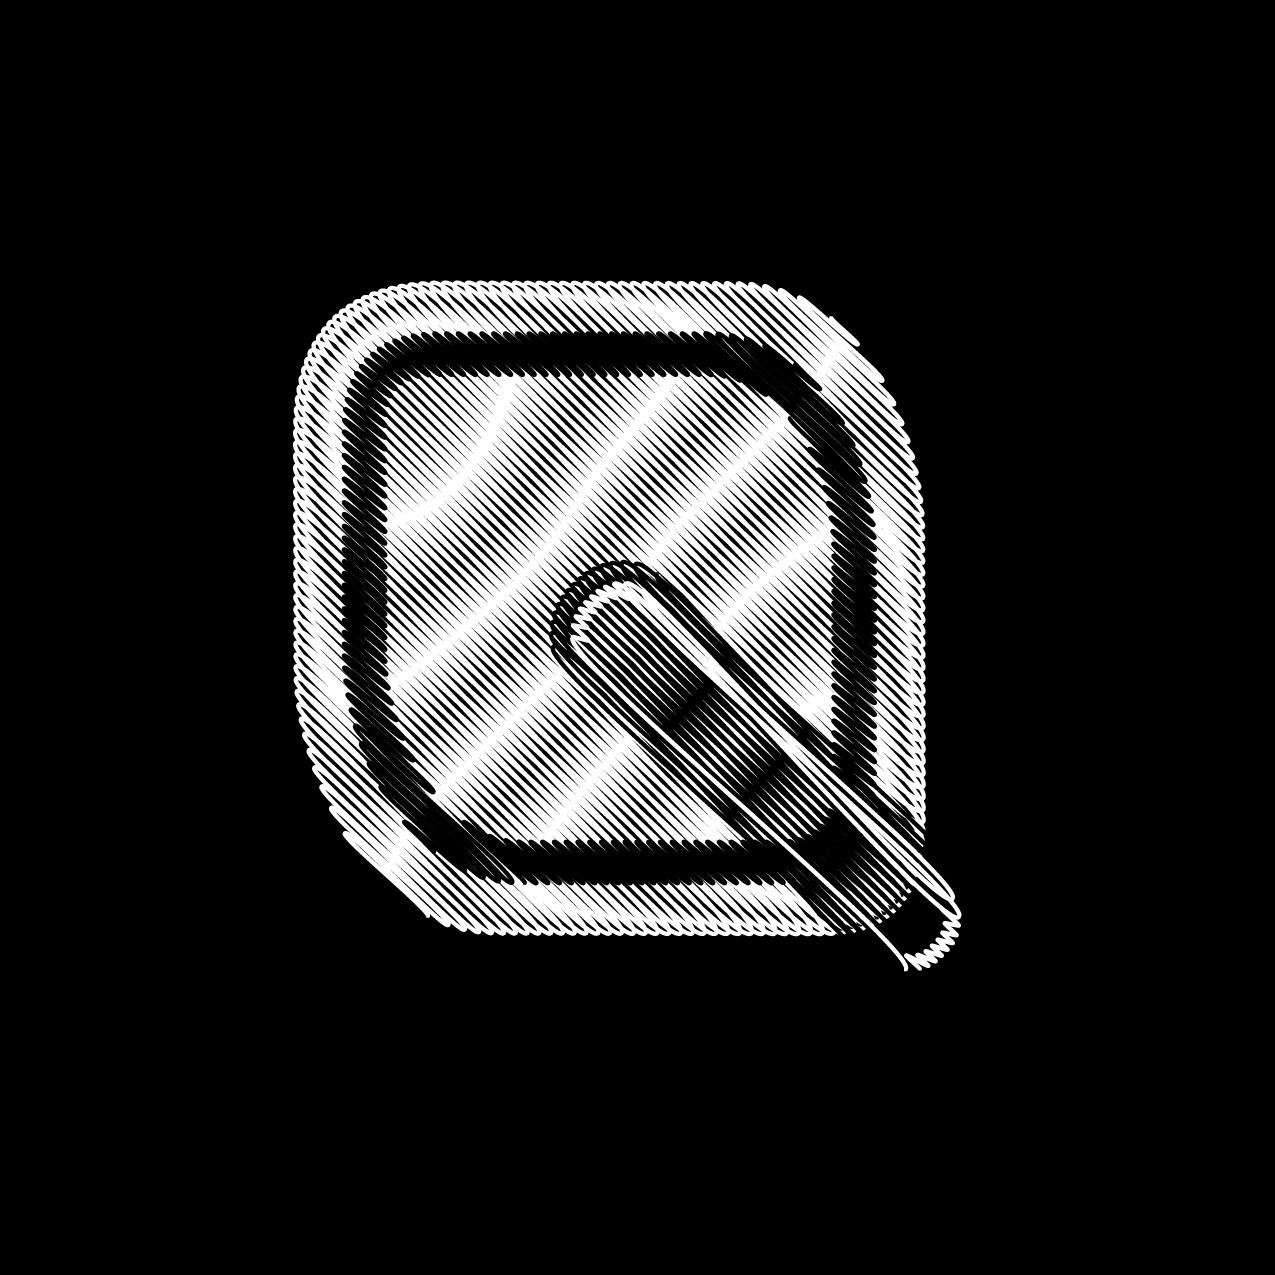 Letter Q3 Design by Furia